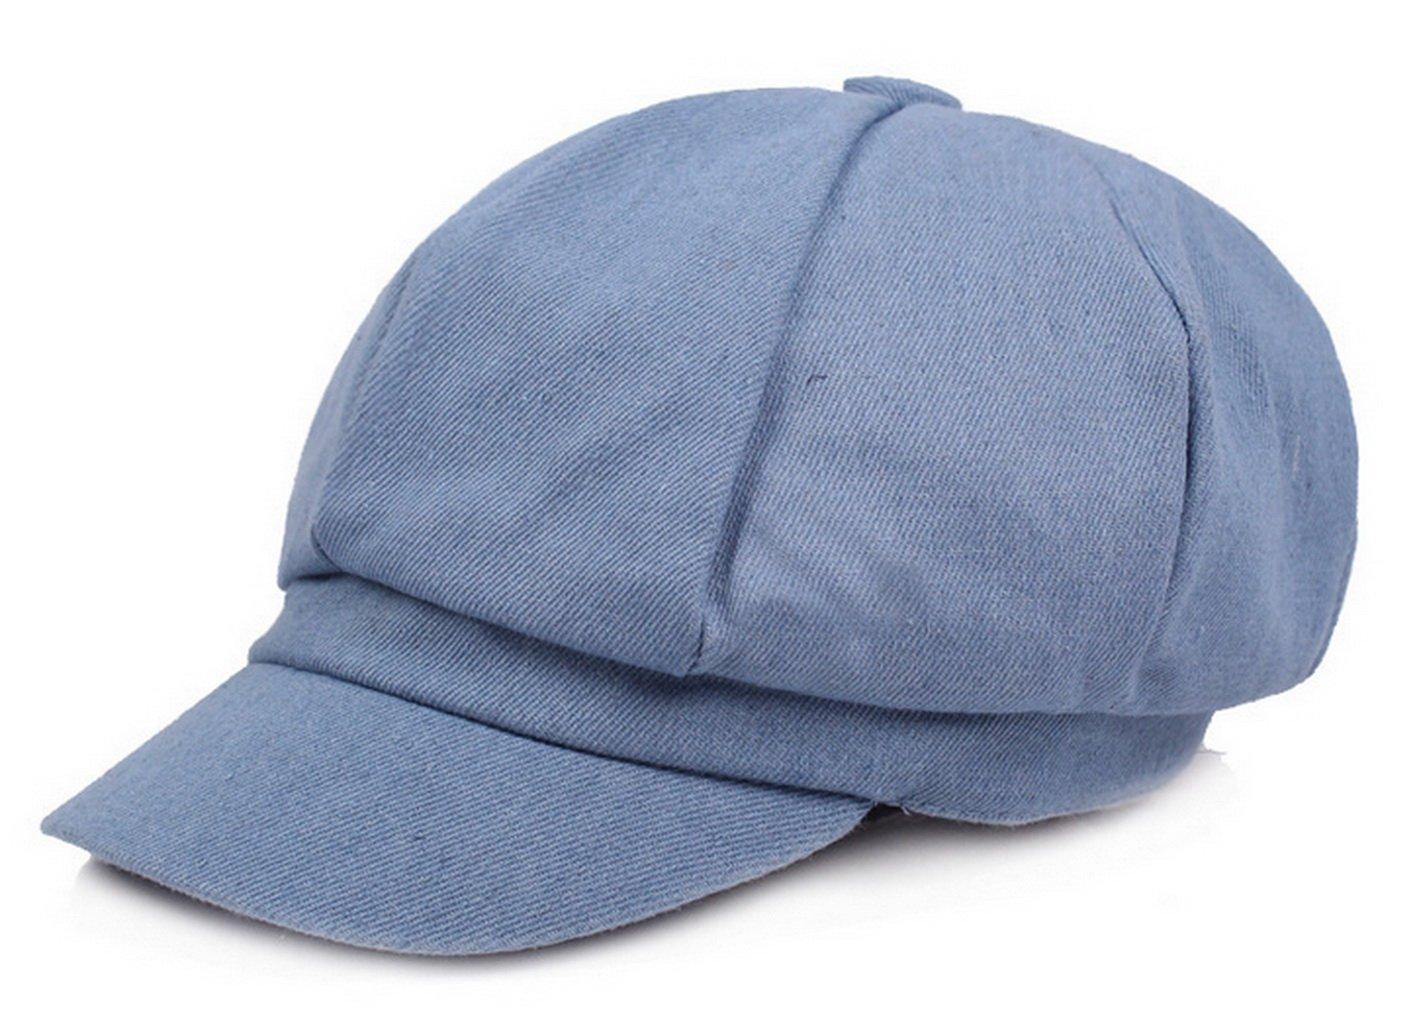 Women Denim Newsboy Cabbie Peaked Beret Cap Vintage Baker Boy Visor Artist Hat